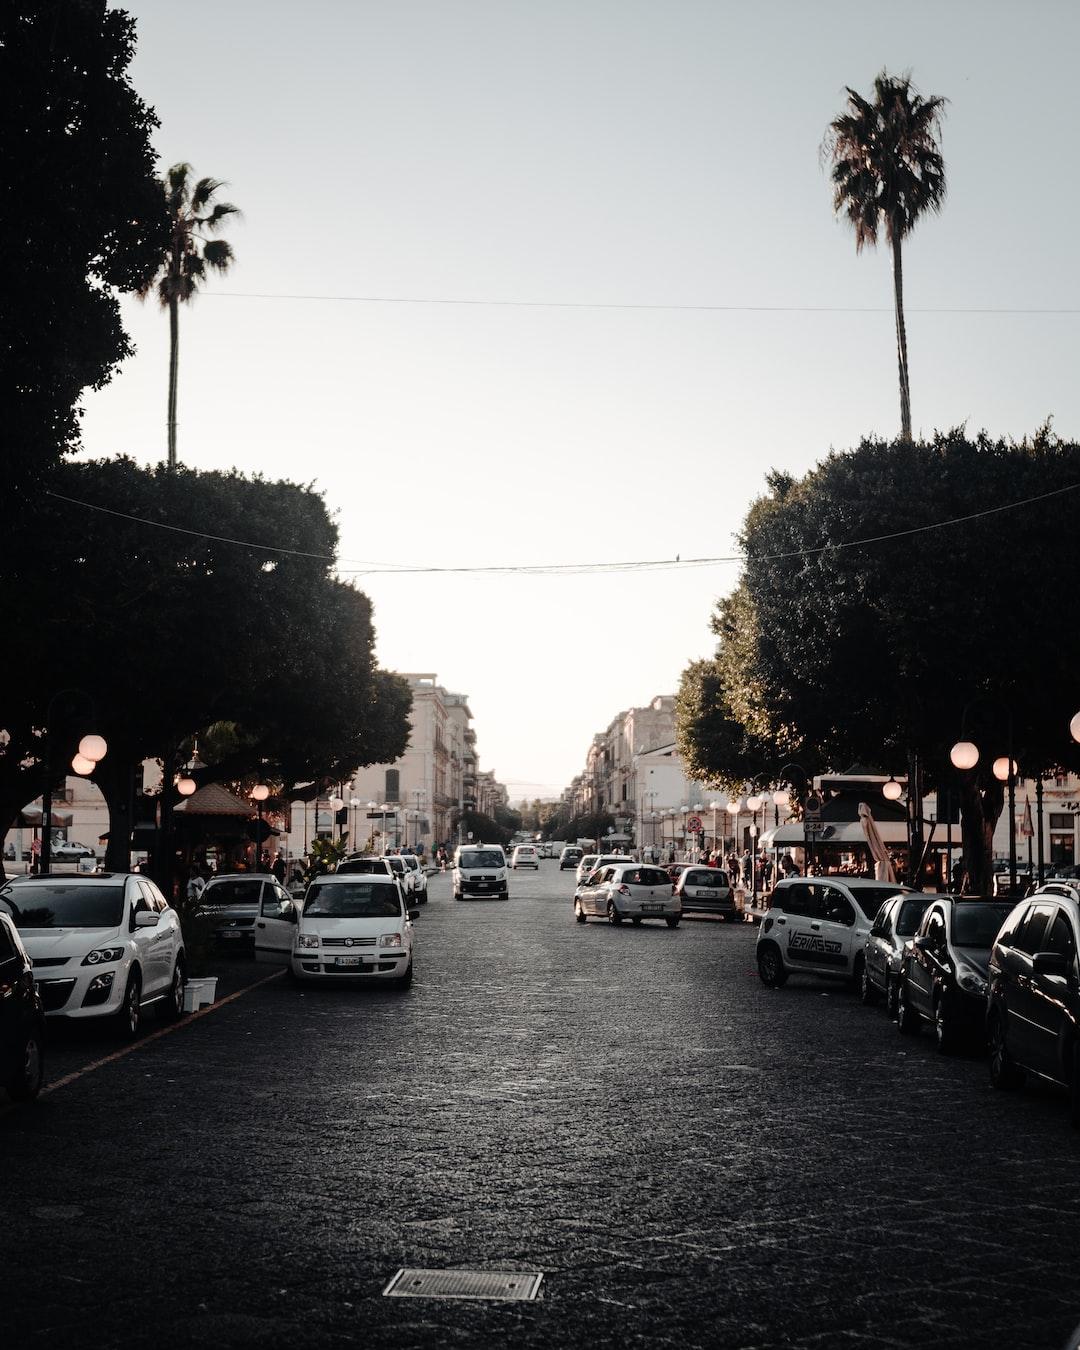 Streets of Isola di Ortigia